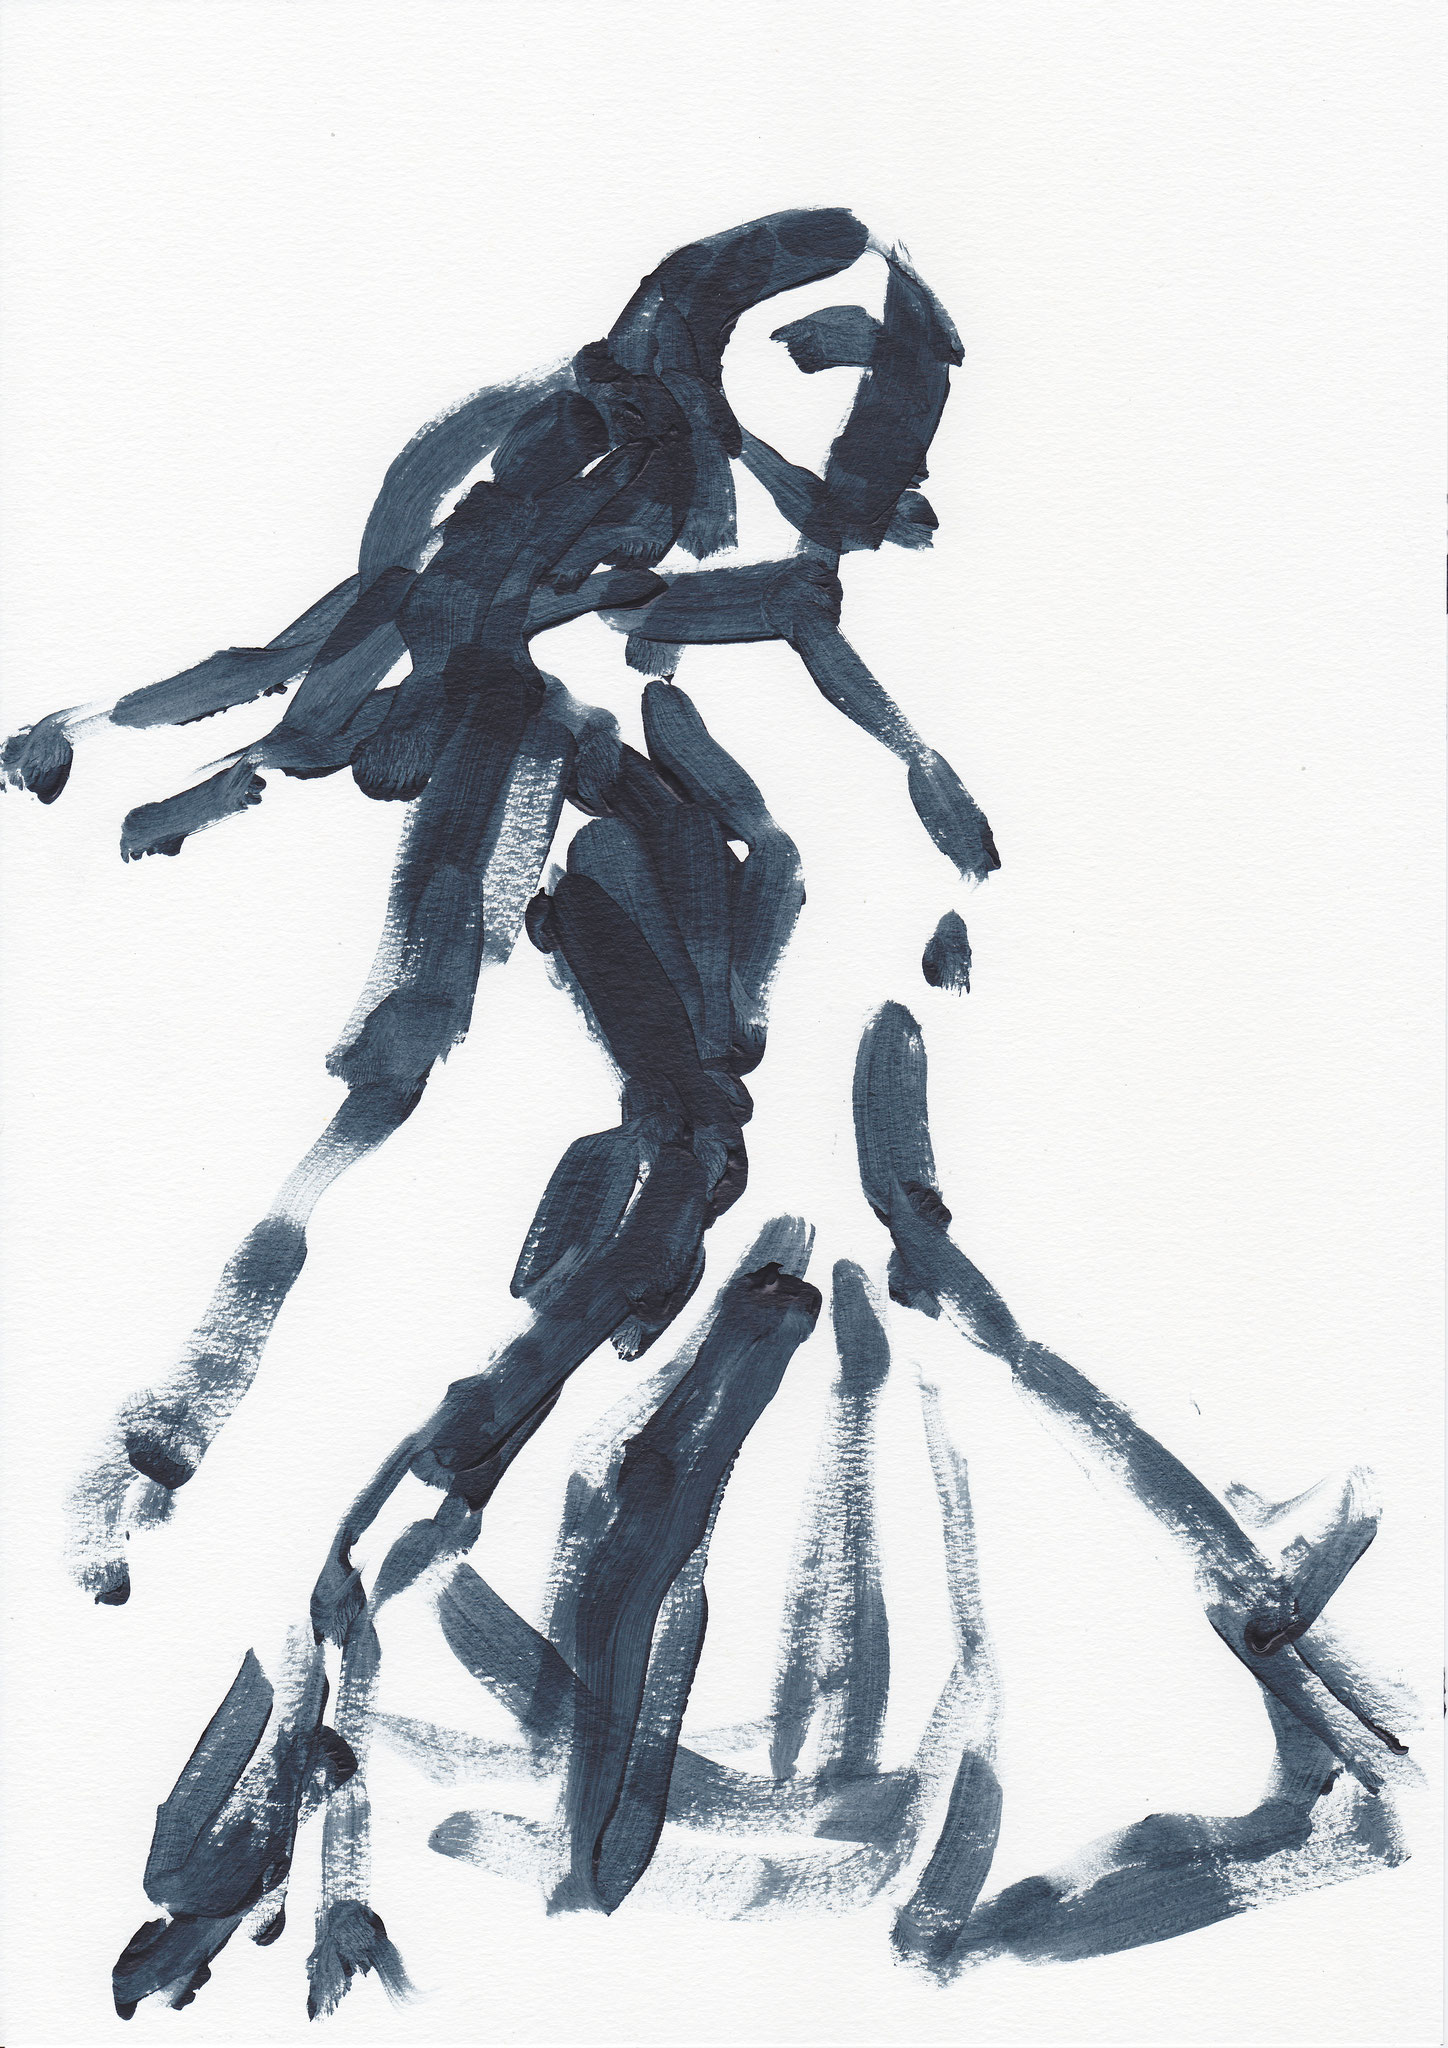 071 , acrylic on paper , 29.7 x 21cm , Selina Saranova